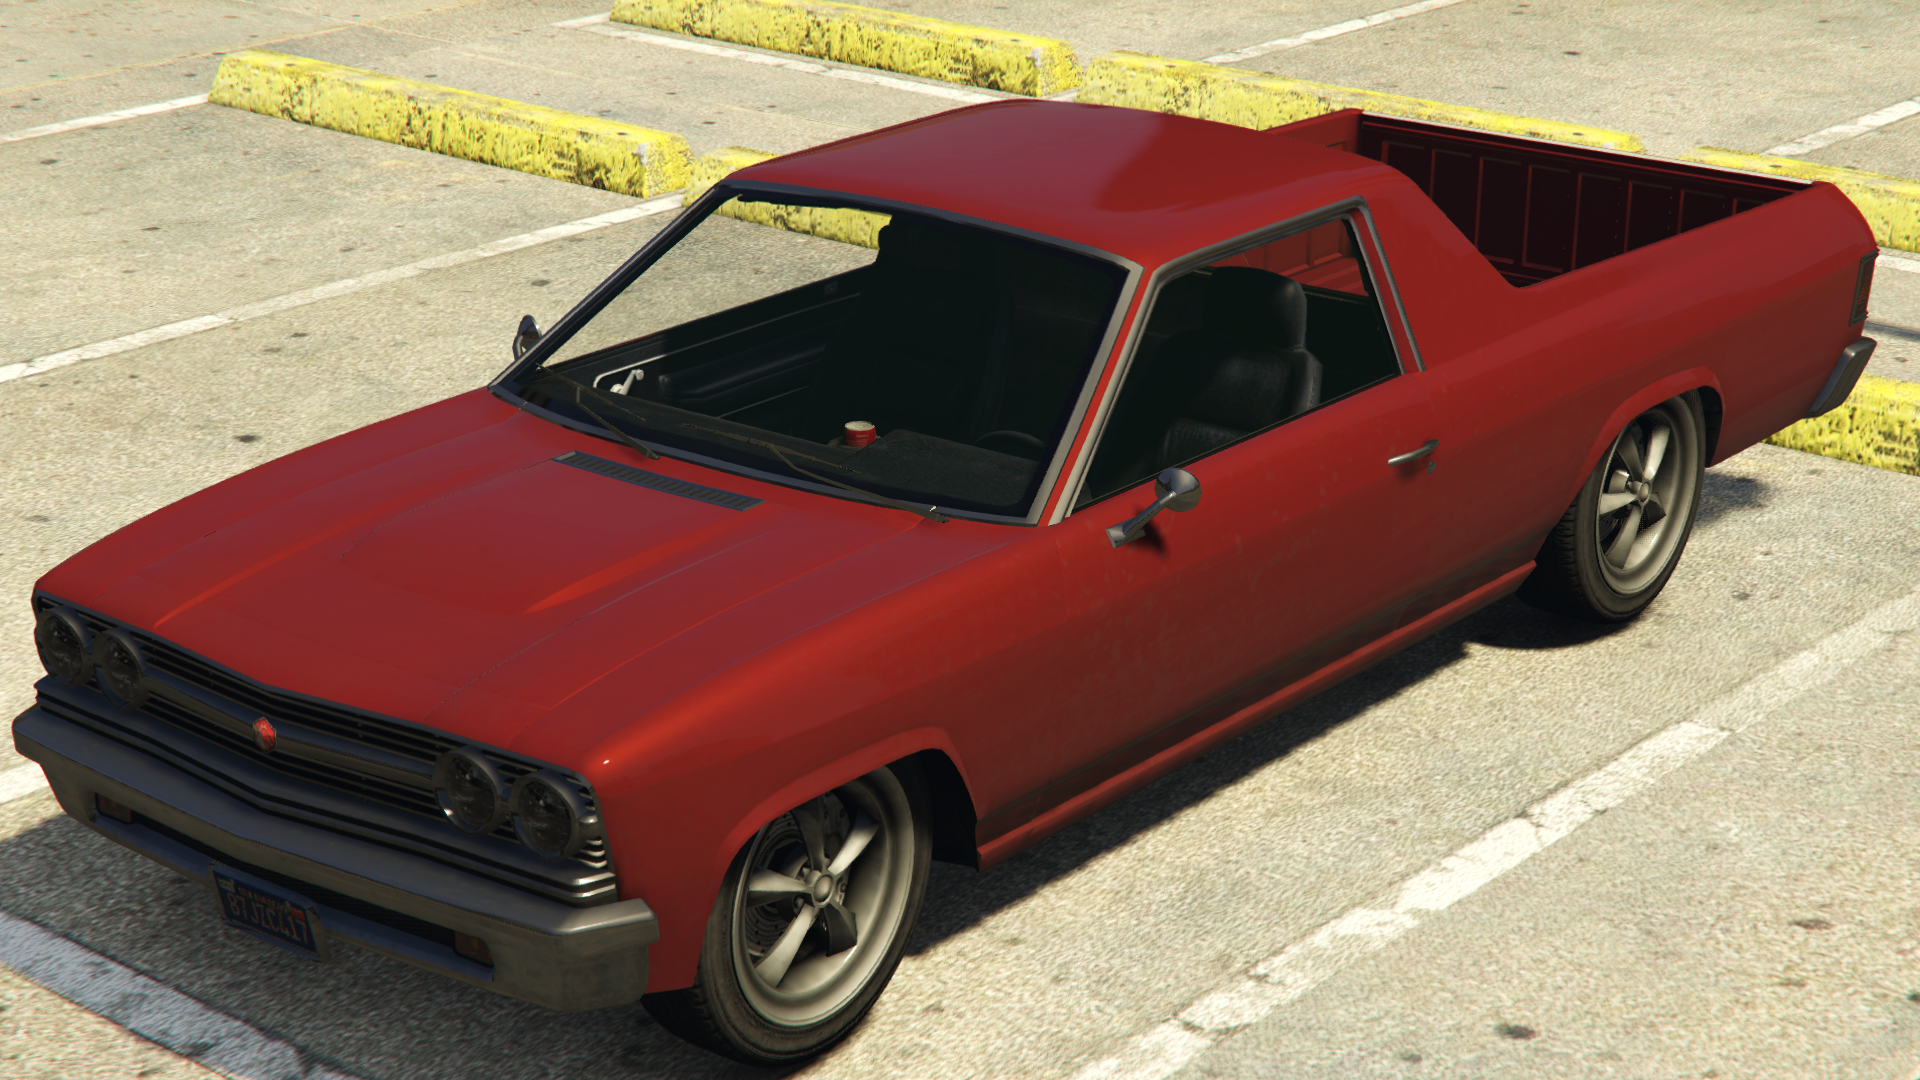 Image cj gtav transparent png gta wiki the grand theft auto wiki - Picador A Picador In Grand Theft Auto